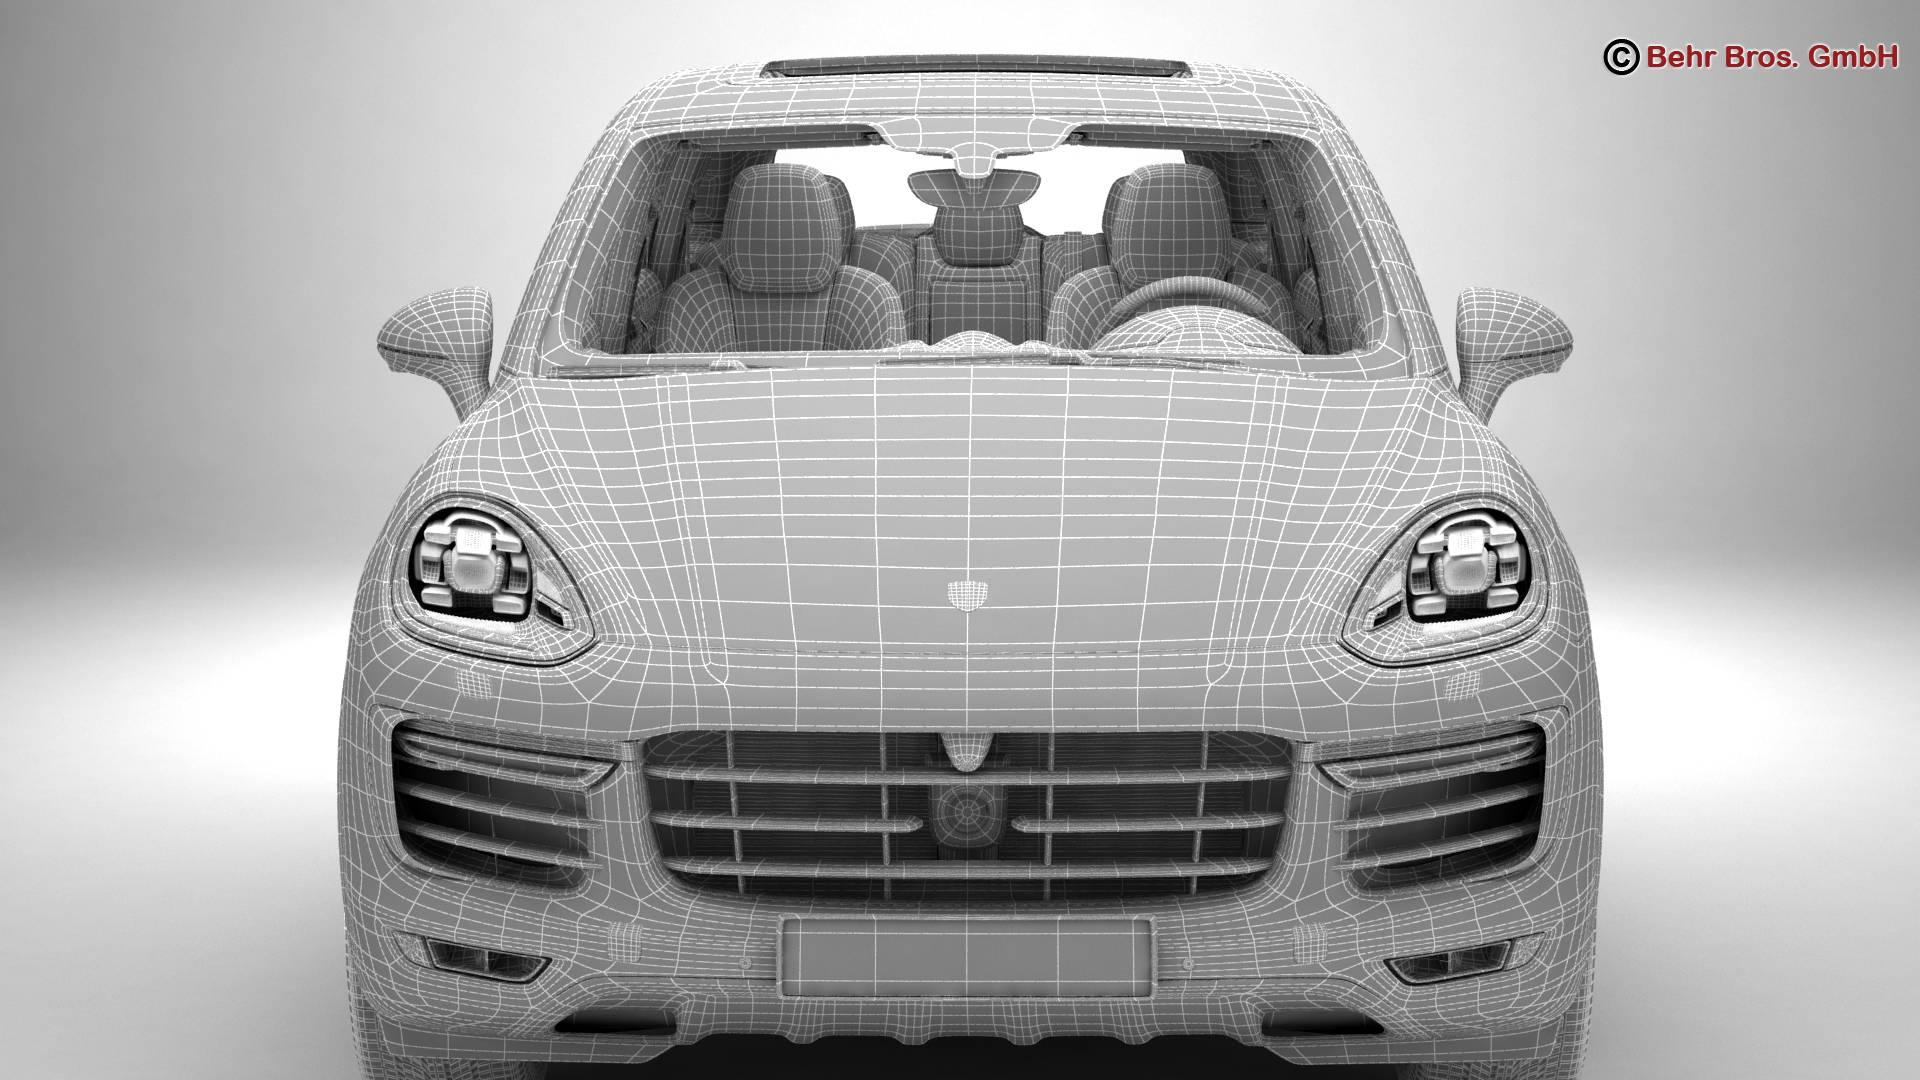 porsche cayenne turbo s 2016 3d model 3ds max fbx c4d lwo ma mb obj 214947